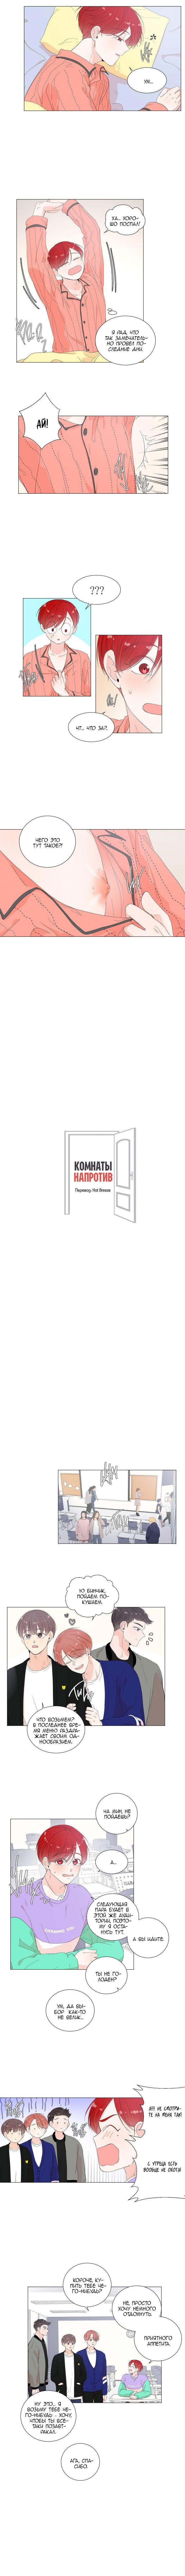 Манга Комнаты напротив - Глава 14 Страница 1